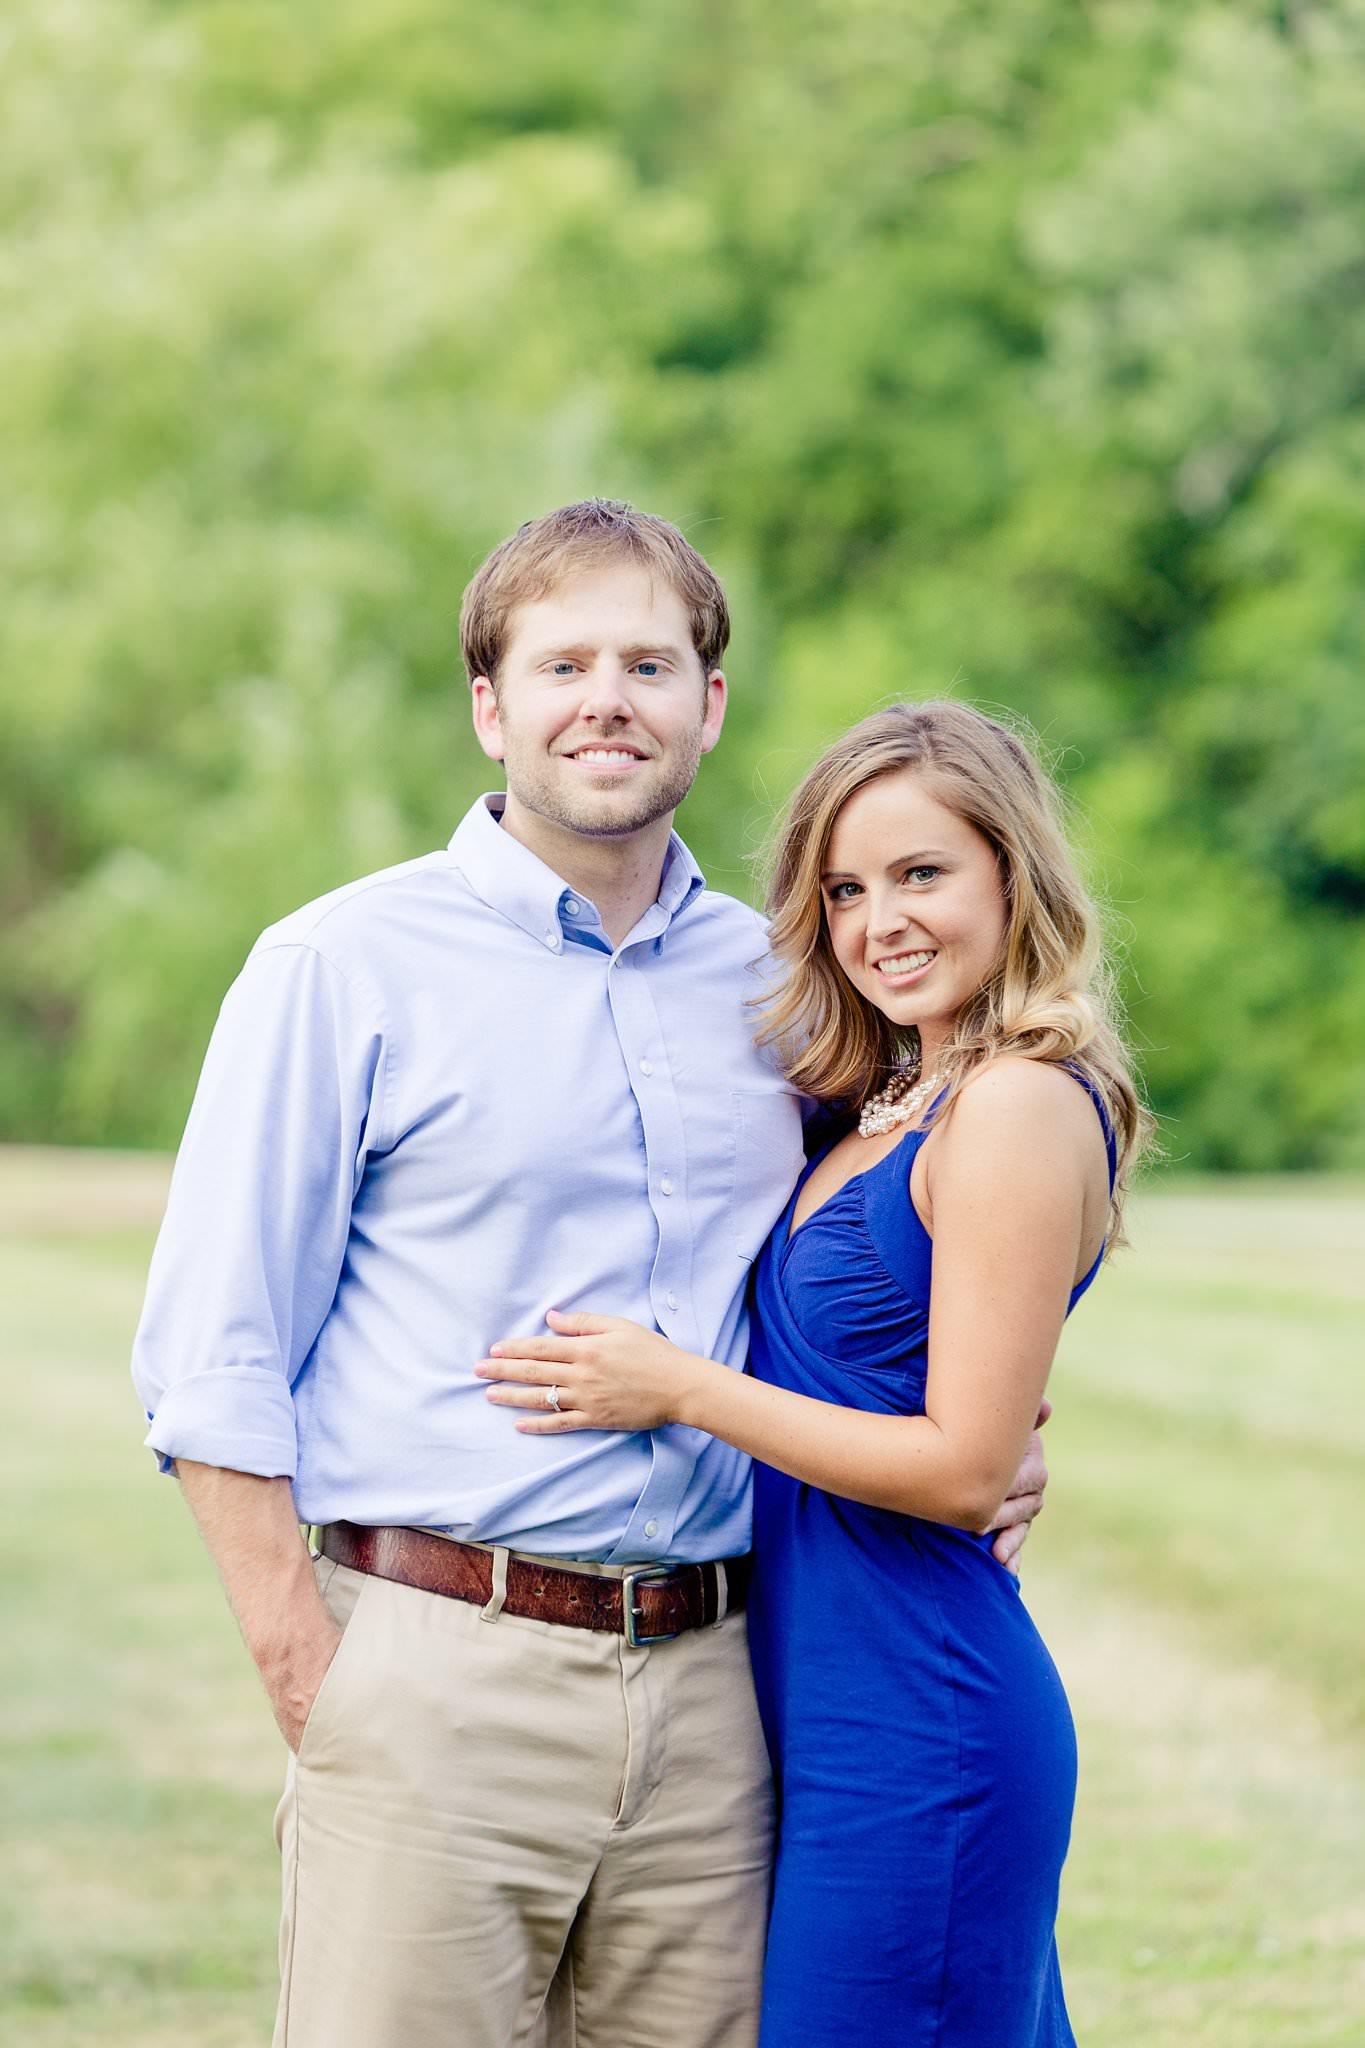 Lexington Kentucky Engagement Session Photographer